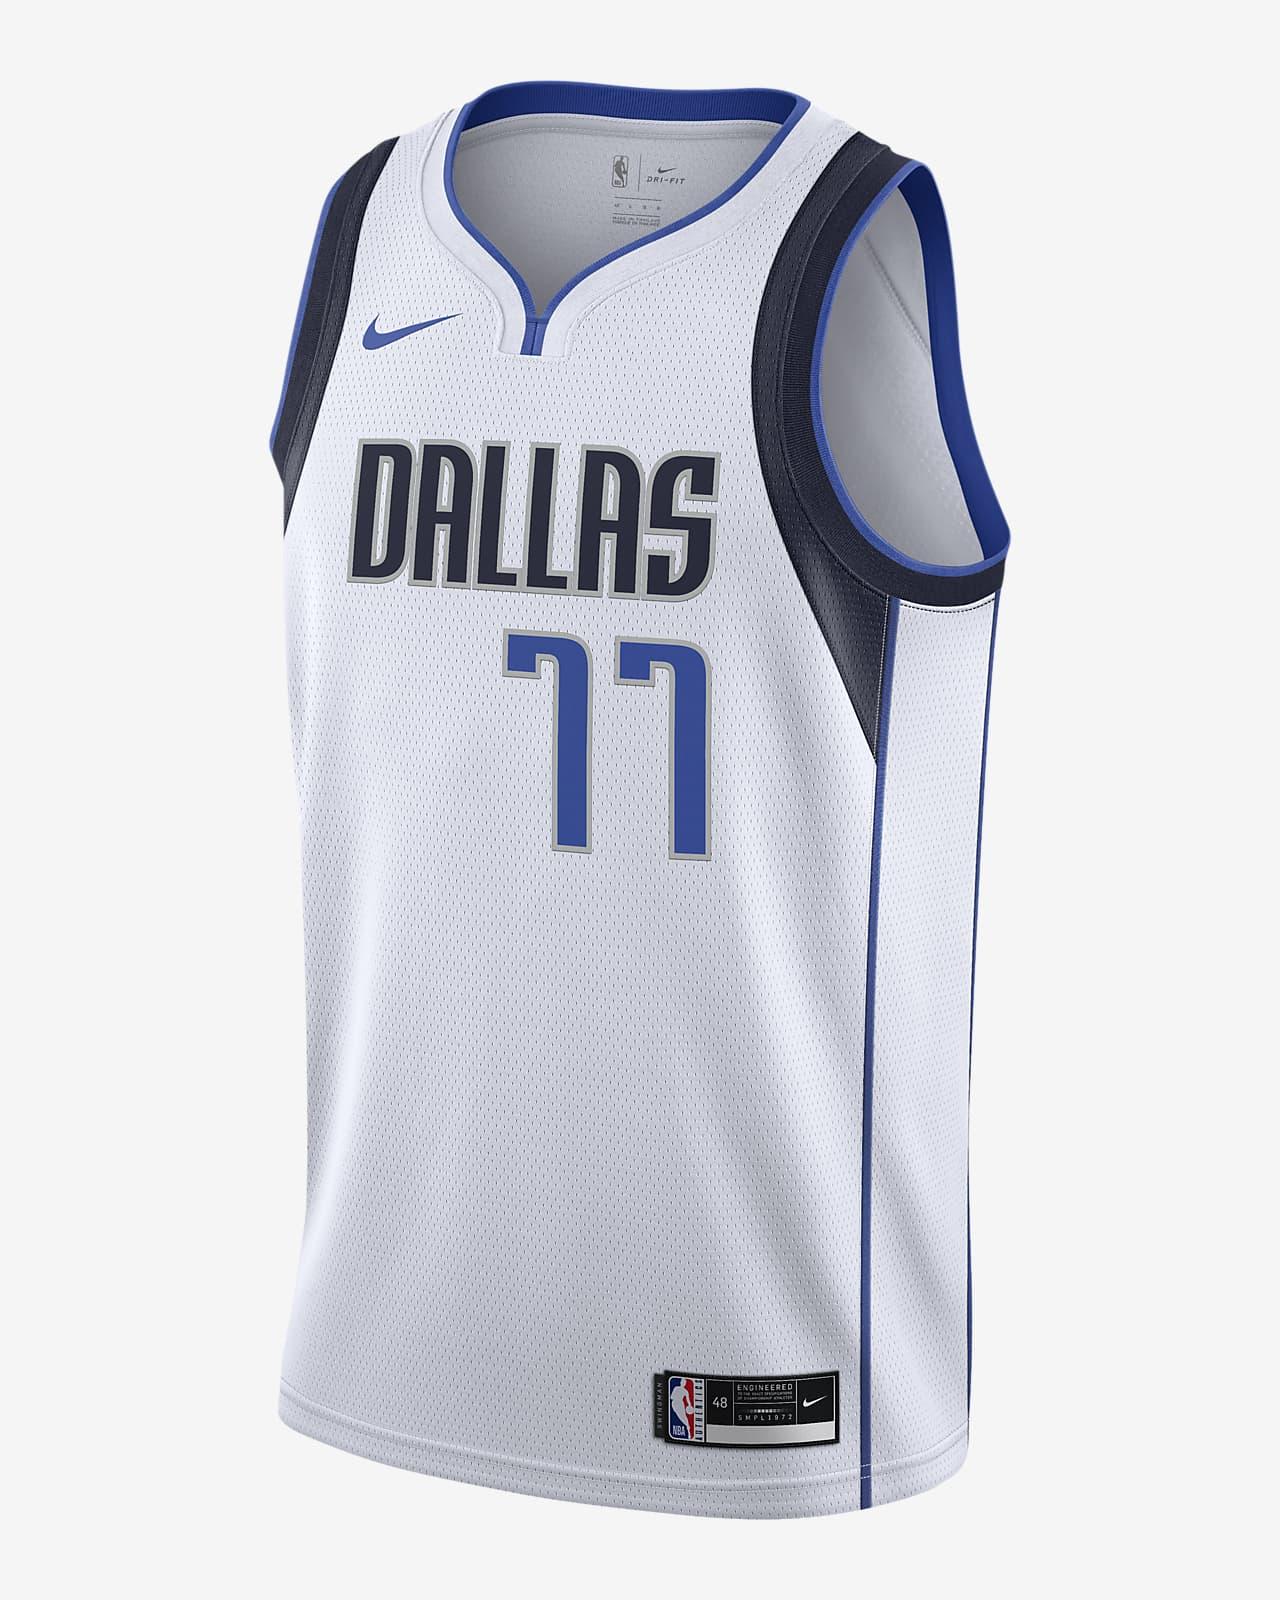 Coherente taquigrafía mensaje  Luka Doncic Mavericks Association Edition 2020 Nike NBA Swingman Jersey.  Nike GB